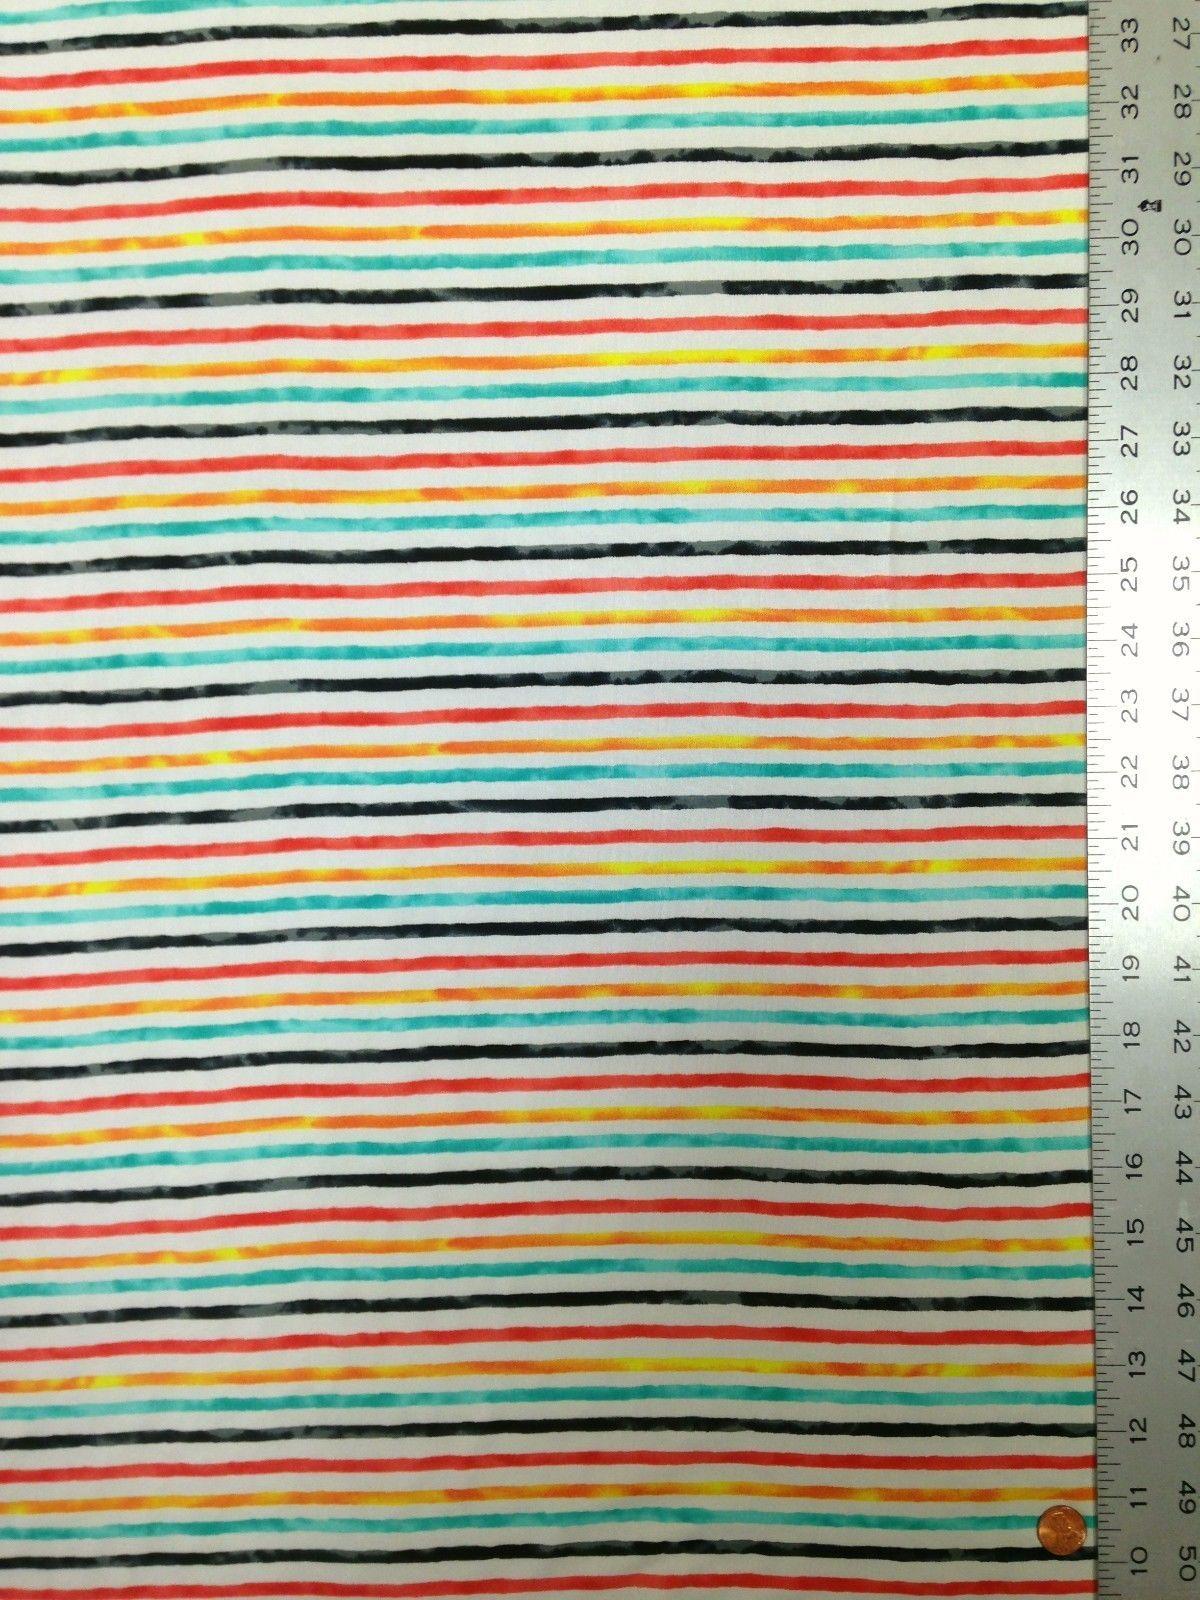 Multi-Color Striped Pattern on Stretch Knit Jersey Polyester Spandex Fabric